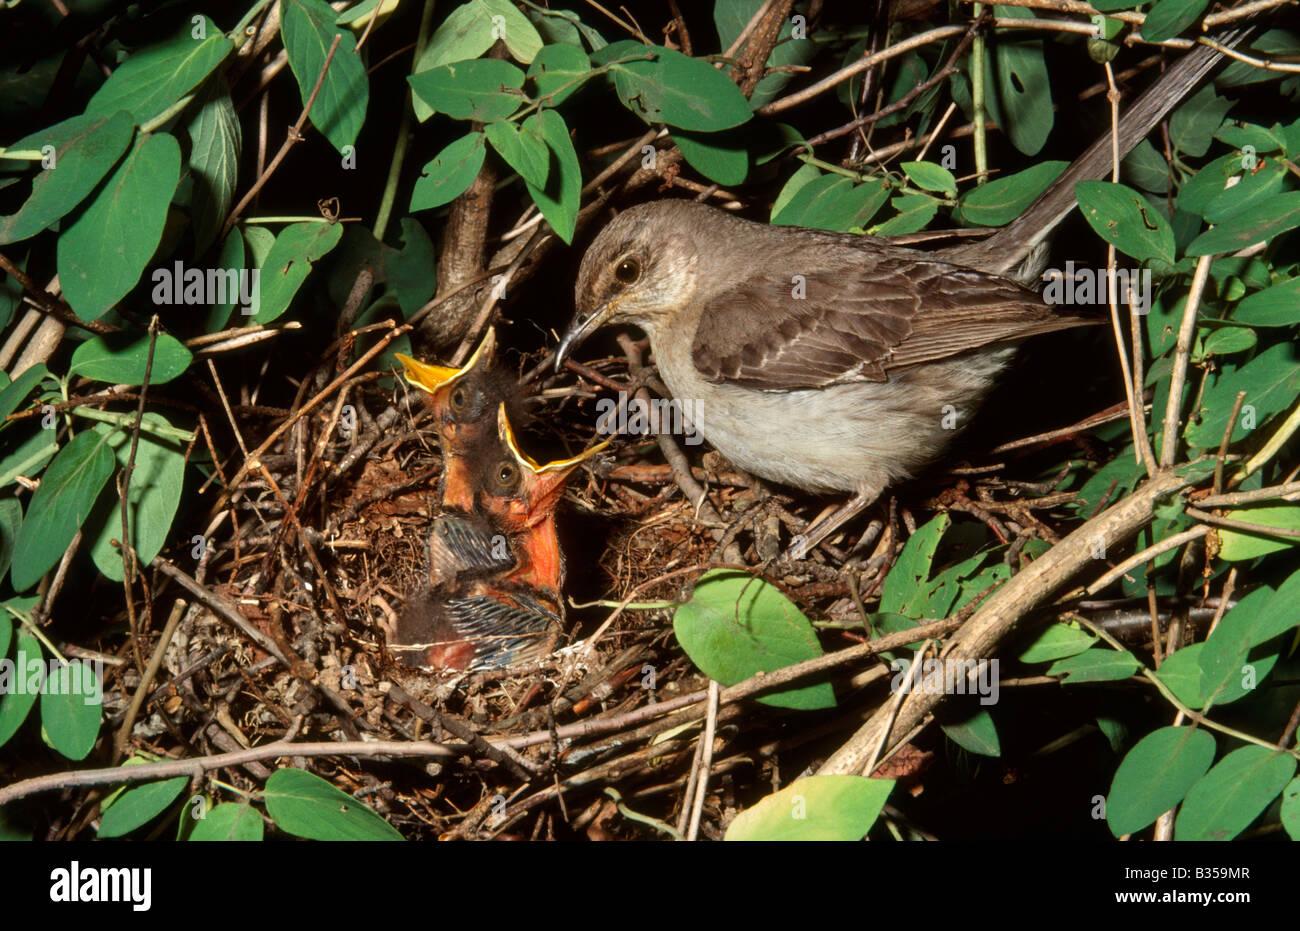 Northern mockingbird (Mimus polyglottos) with chicks, New Jersey, USA Stock Photo